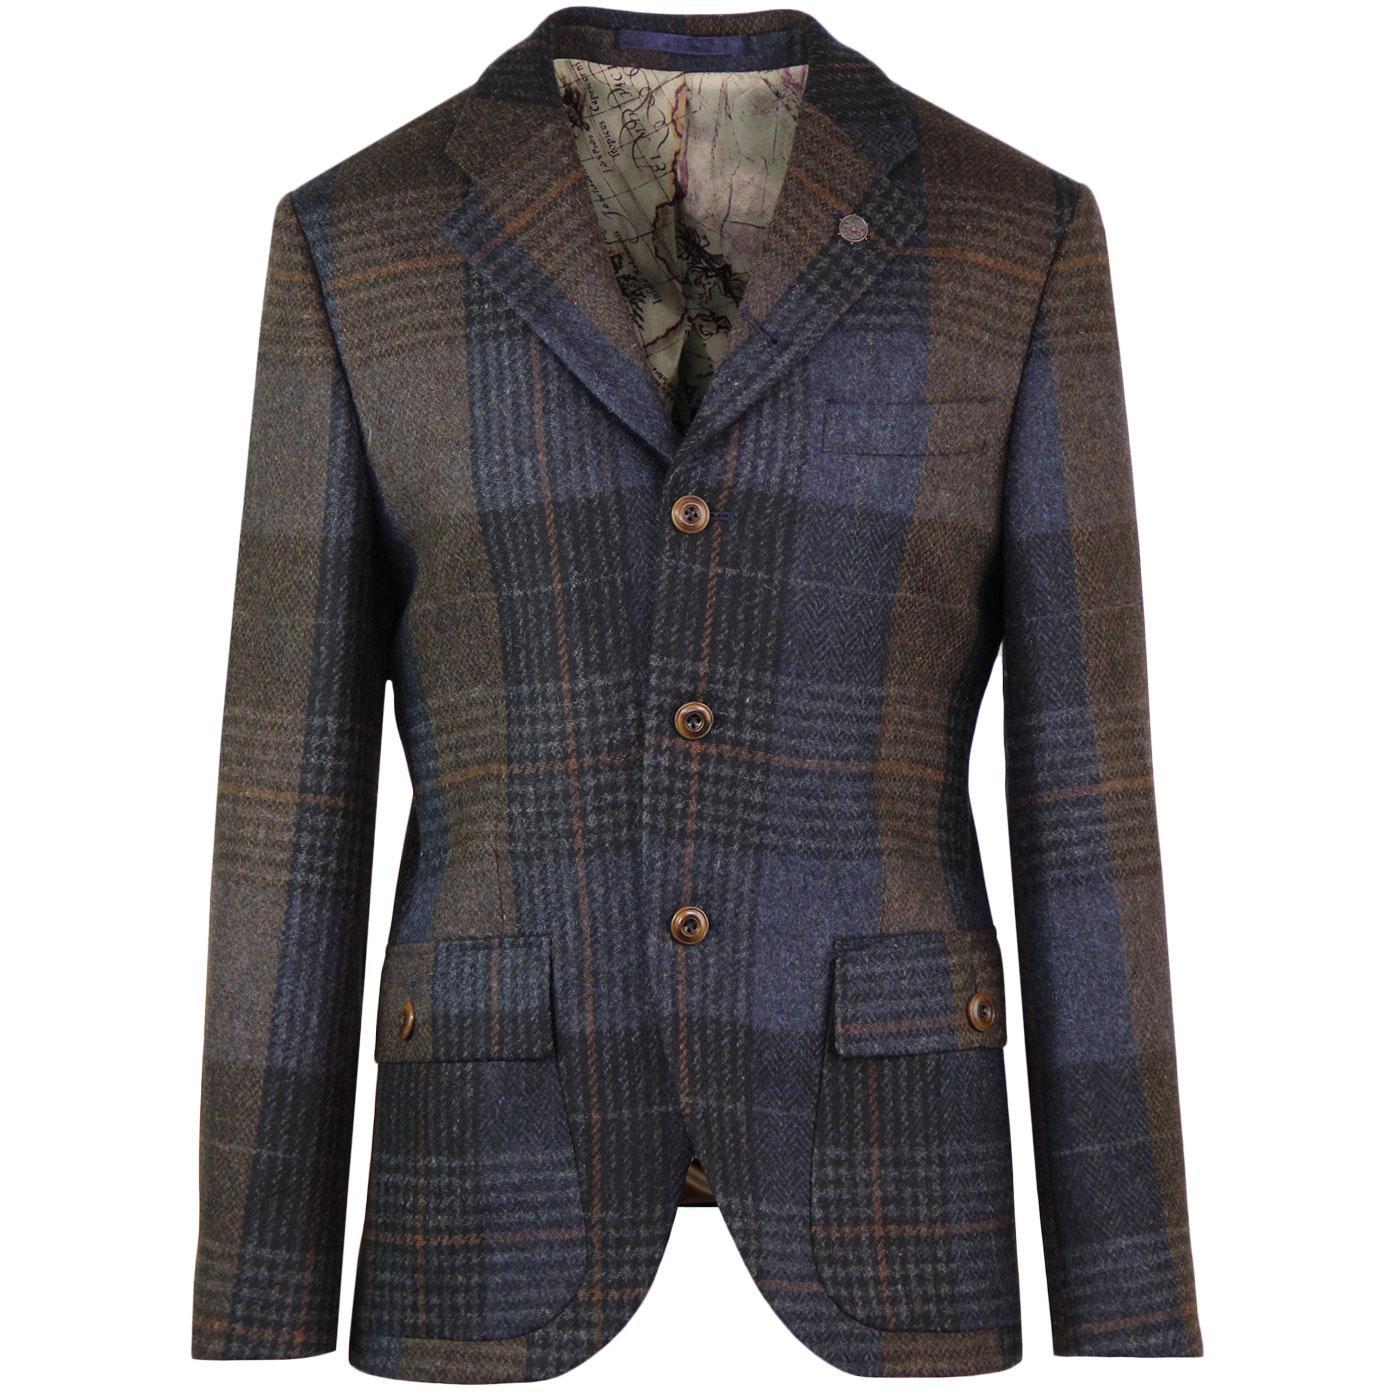 Grouse GIBSON LONDON Mod Check Blazer (Navy/Brown)